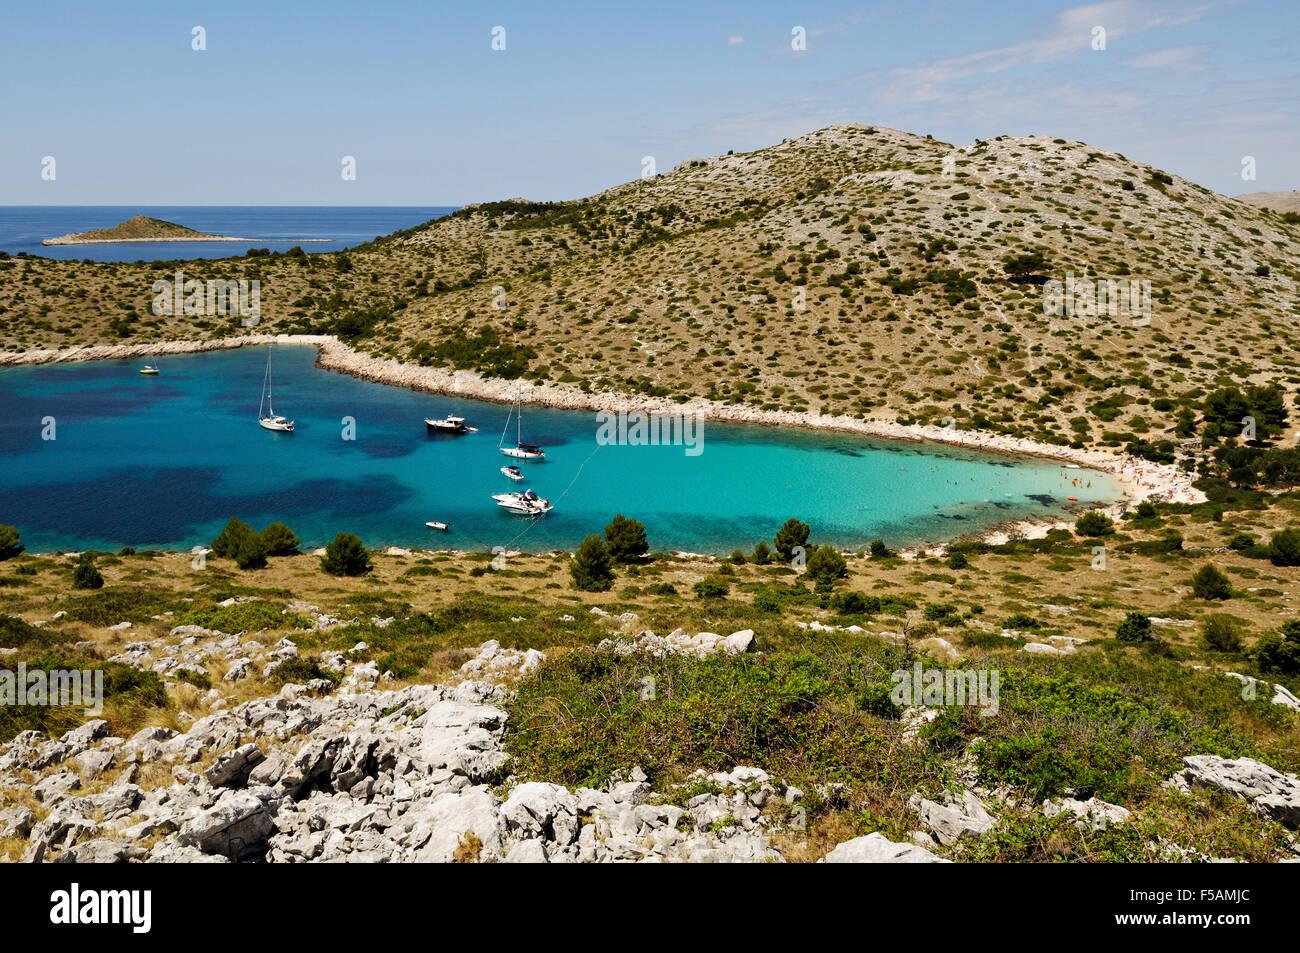 Lojena bay and beach on Levrnaka island, Kornati archipelago, Dalmatia, Croatia Stock Photo